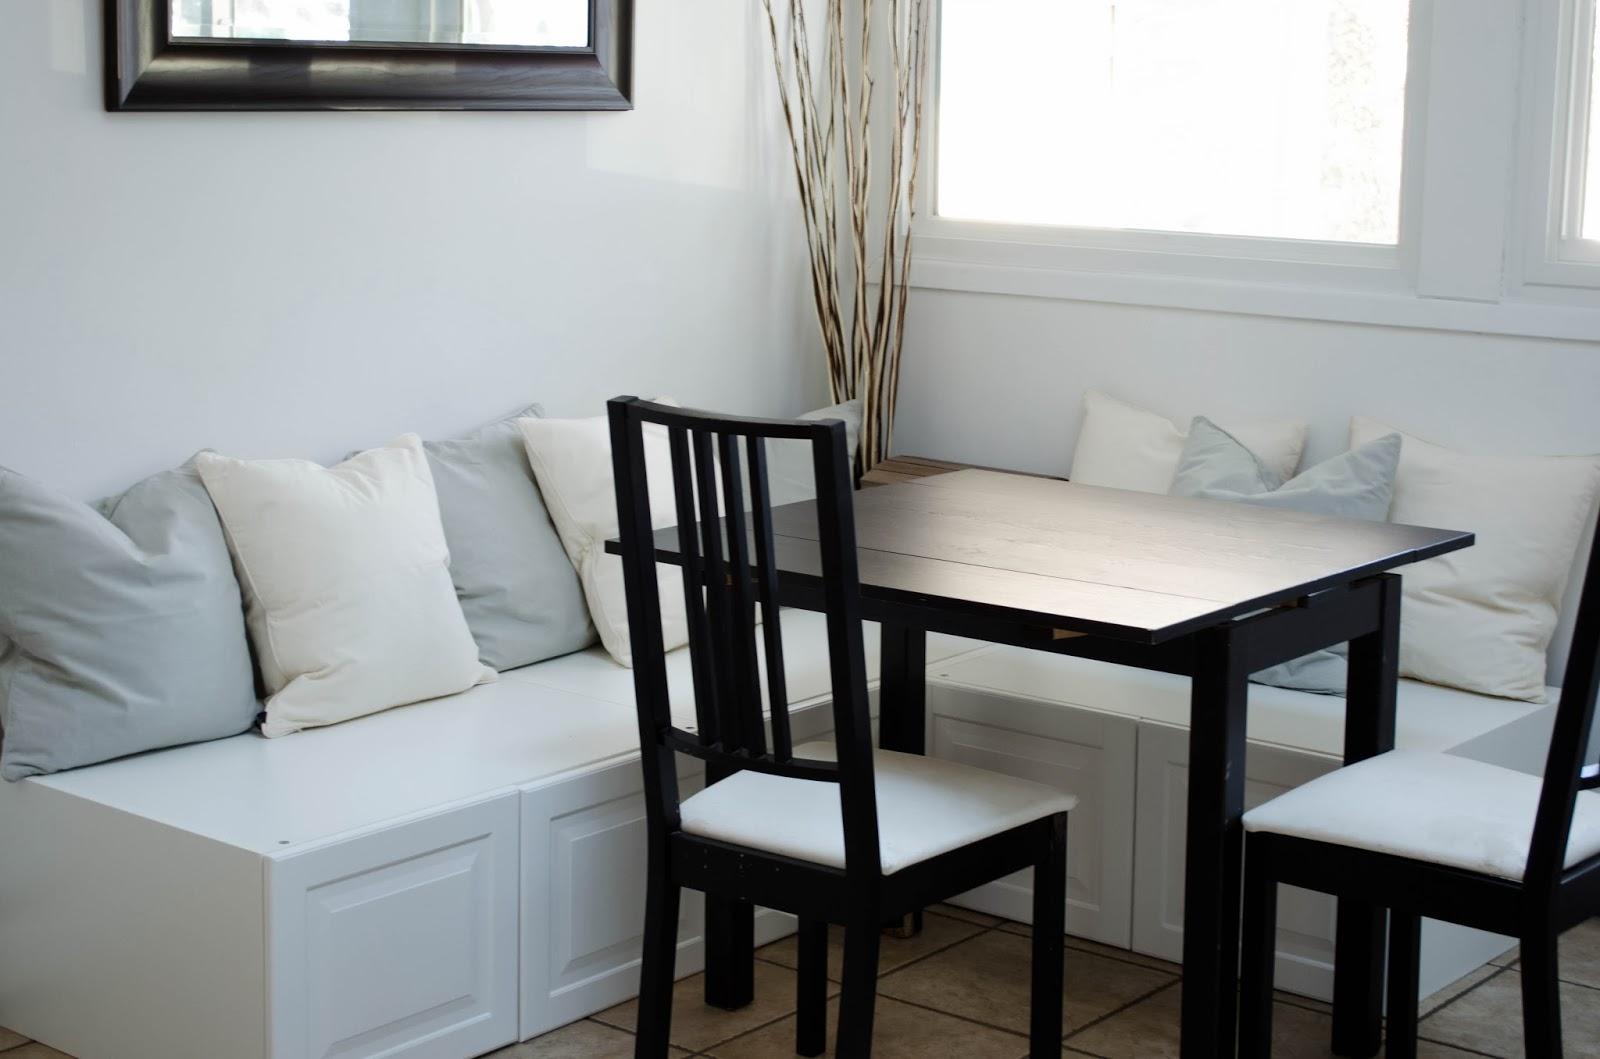 Laura larae 39 s luxuries diy kitchen nook for Ikea breakfast nook set